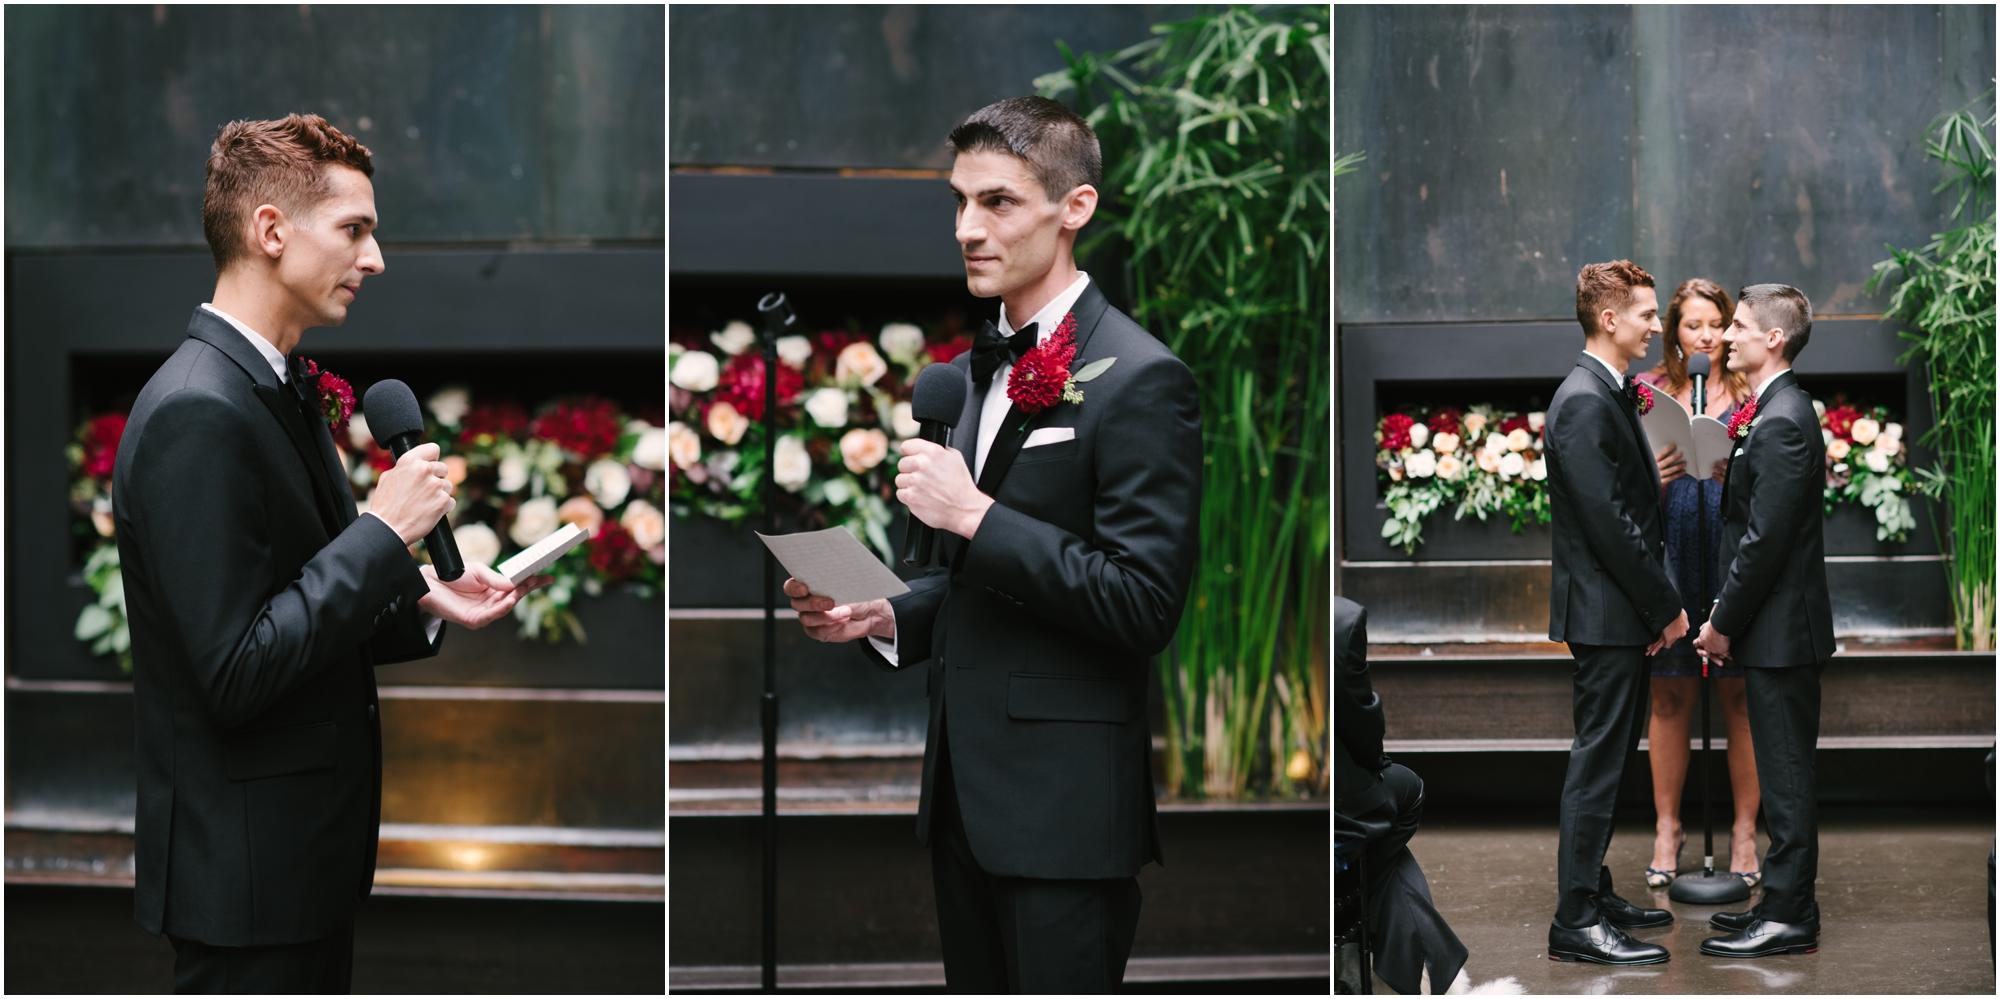 gay-wedding-photographer-williamsburgphotostudios-thefoundry-wedding-photographer_0028.jpg